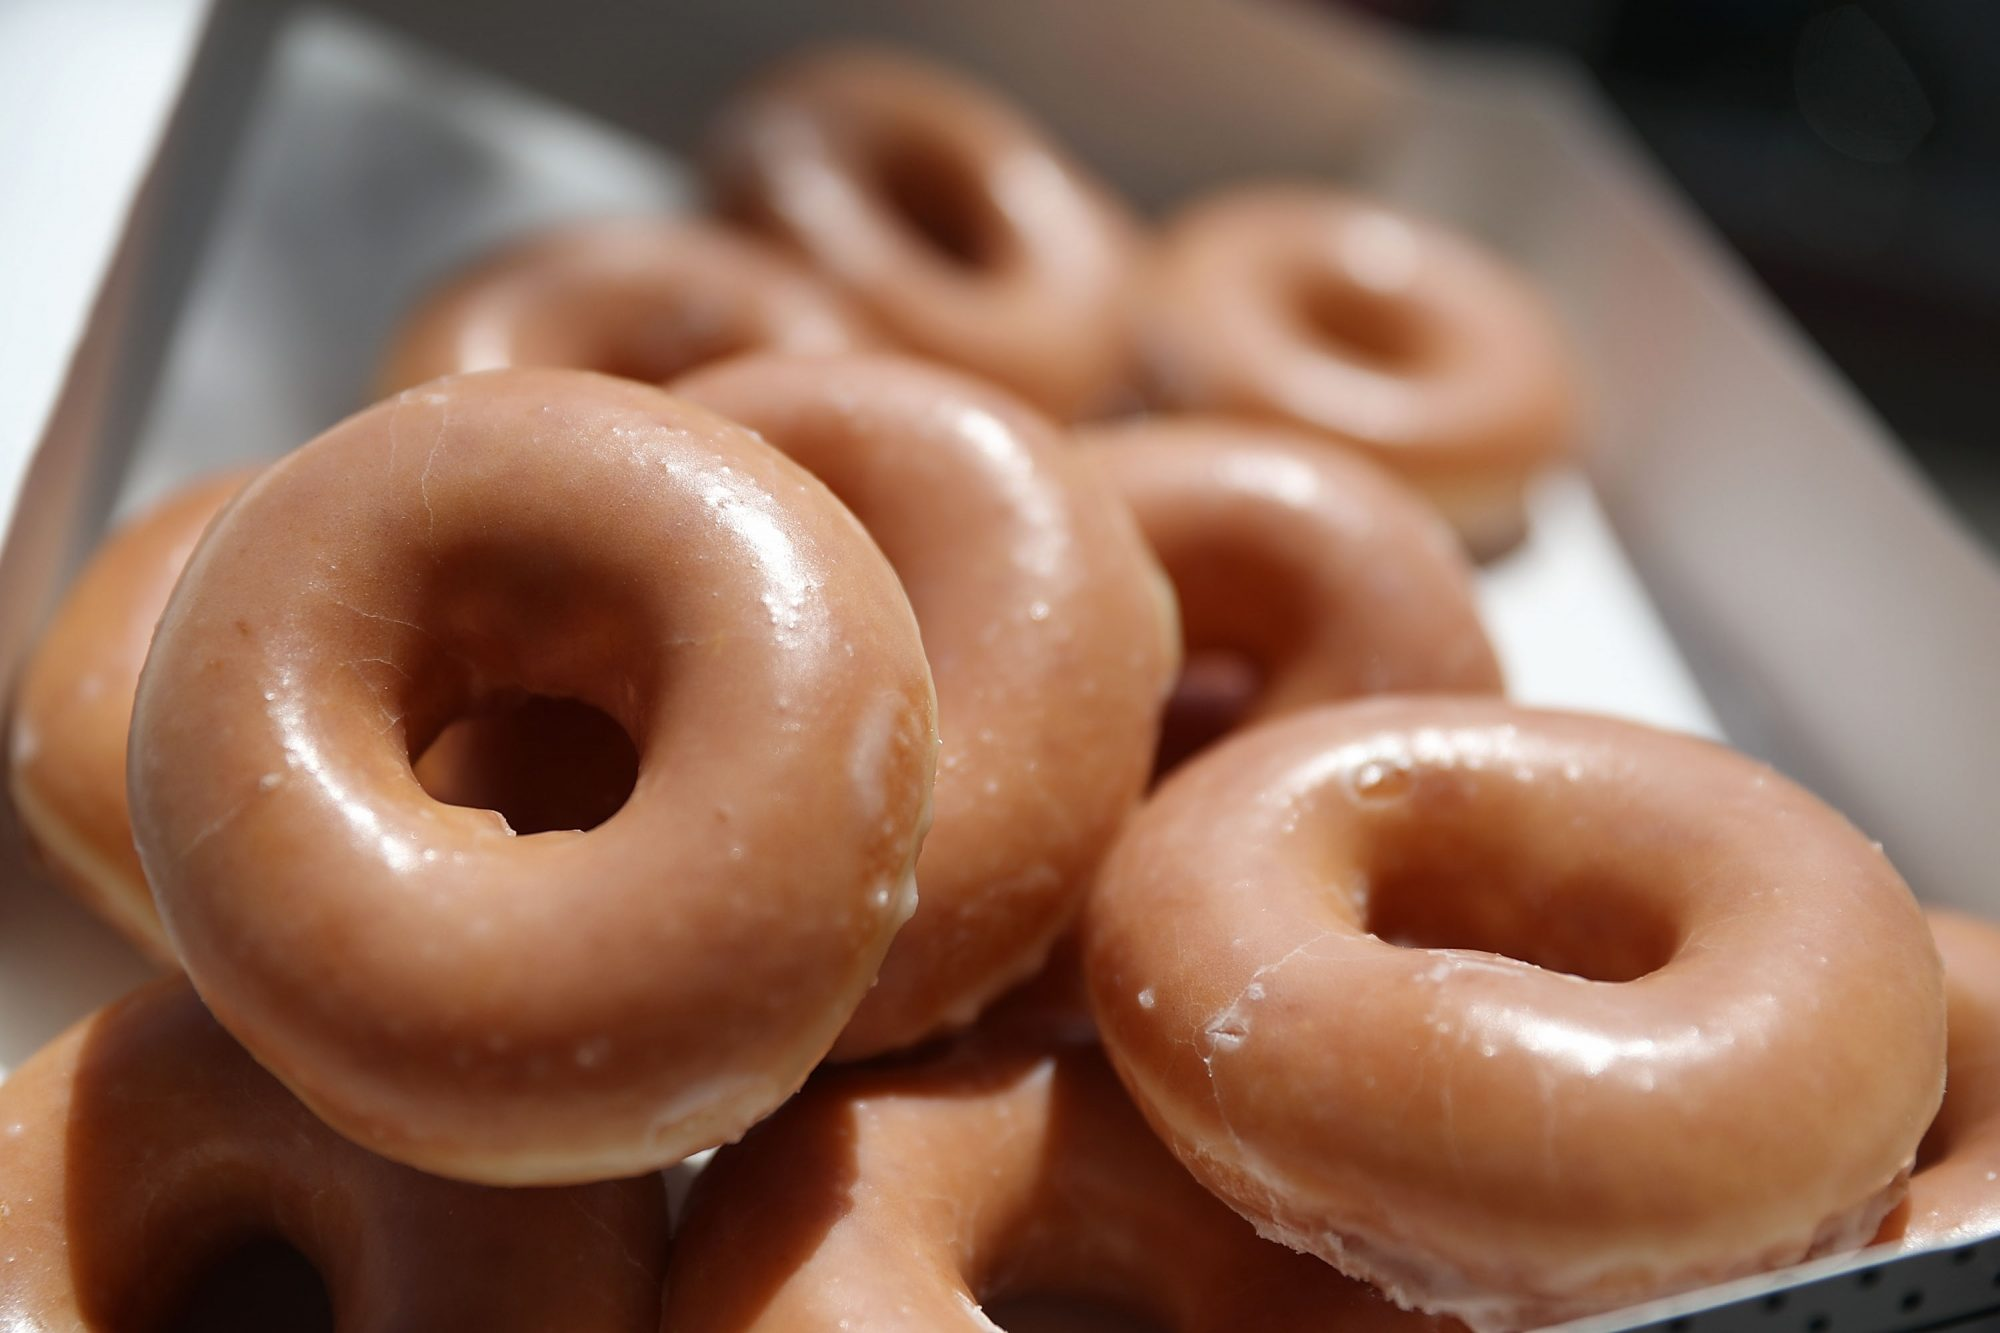 getty-doughnut-image